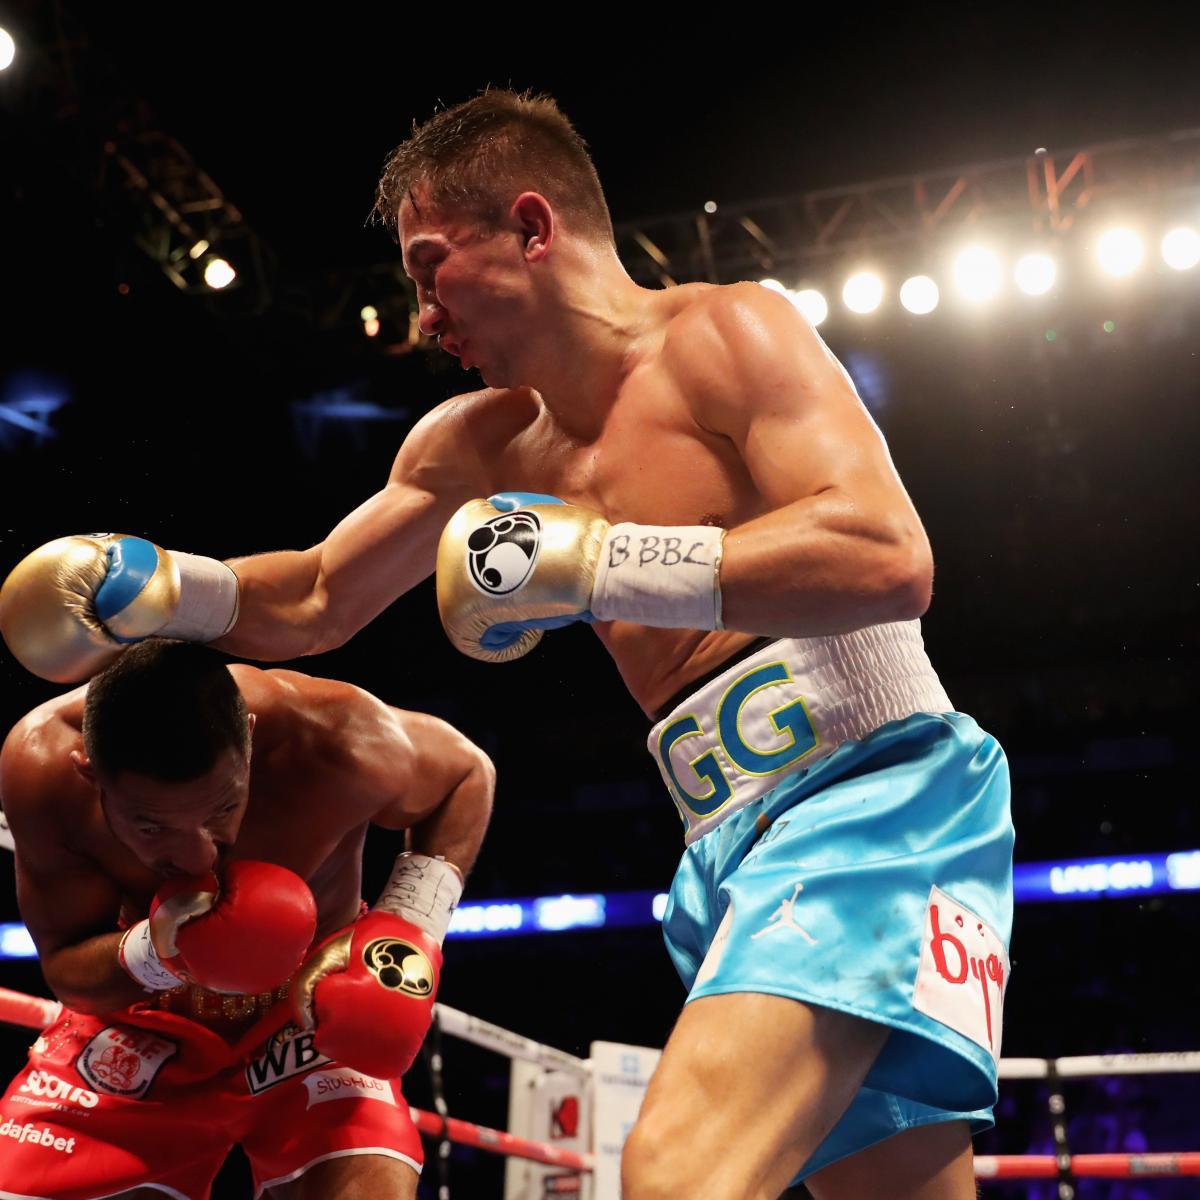 RESULTS: Golovkin destroys Rolls — Boxing News & Views